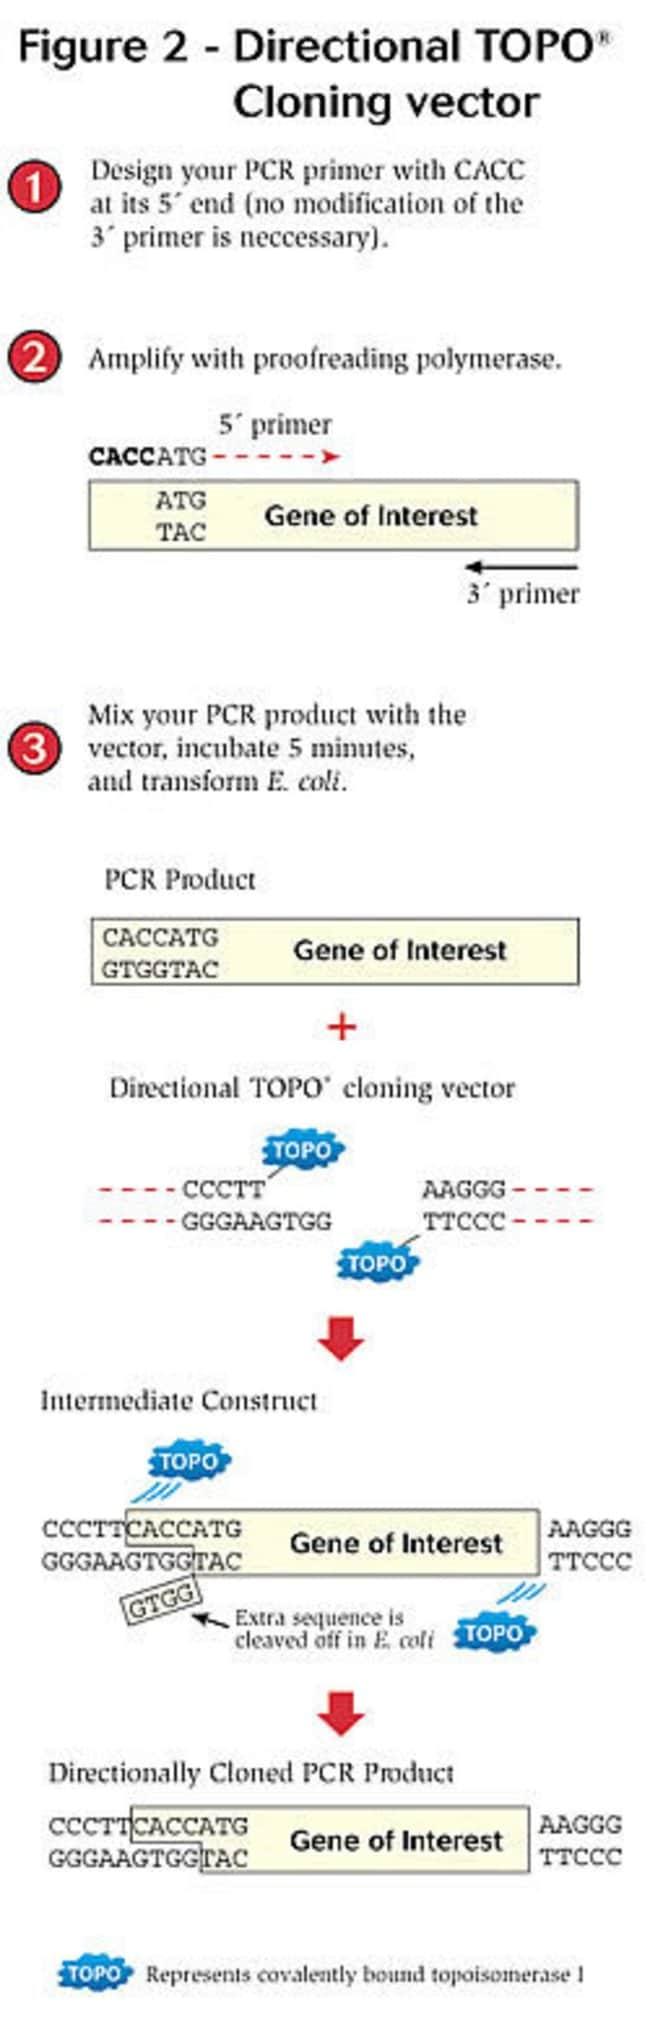 Figure 2 - Directional TOPO® Cloning vector